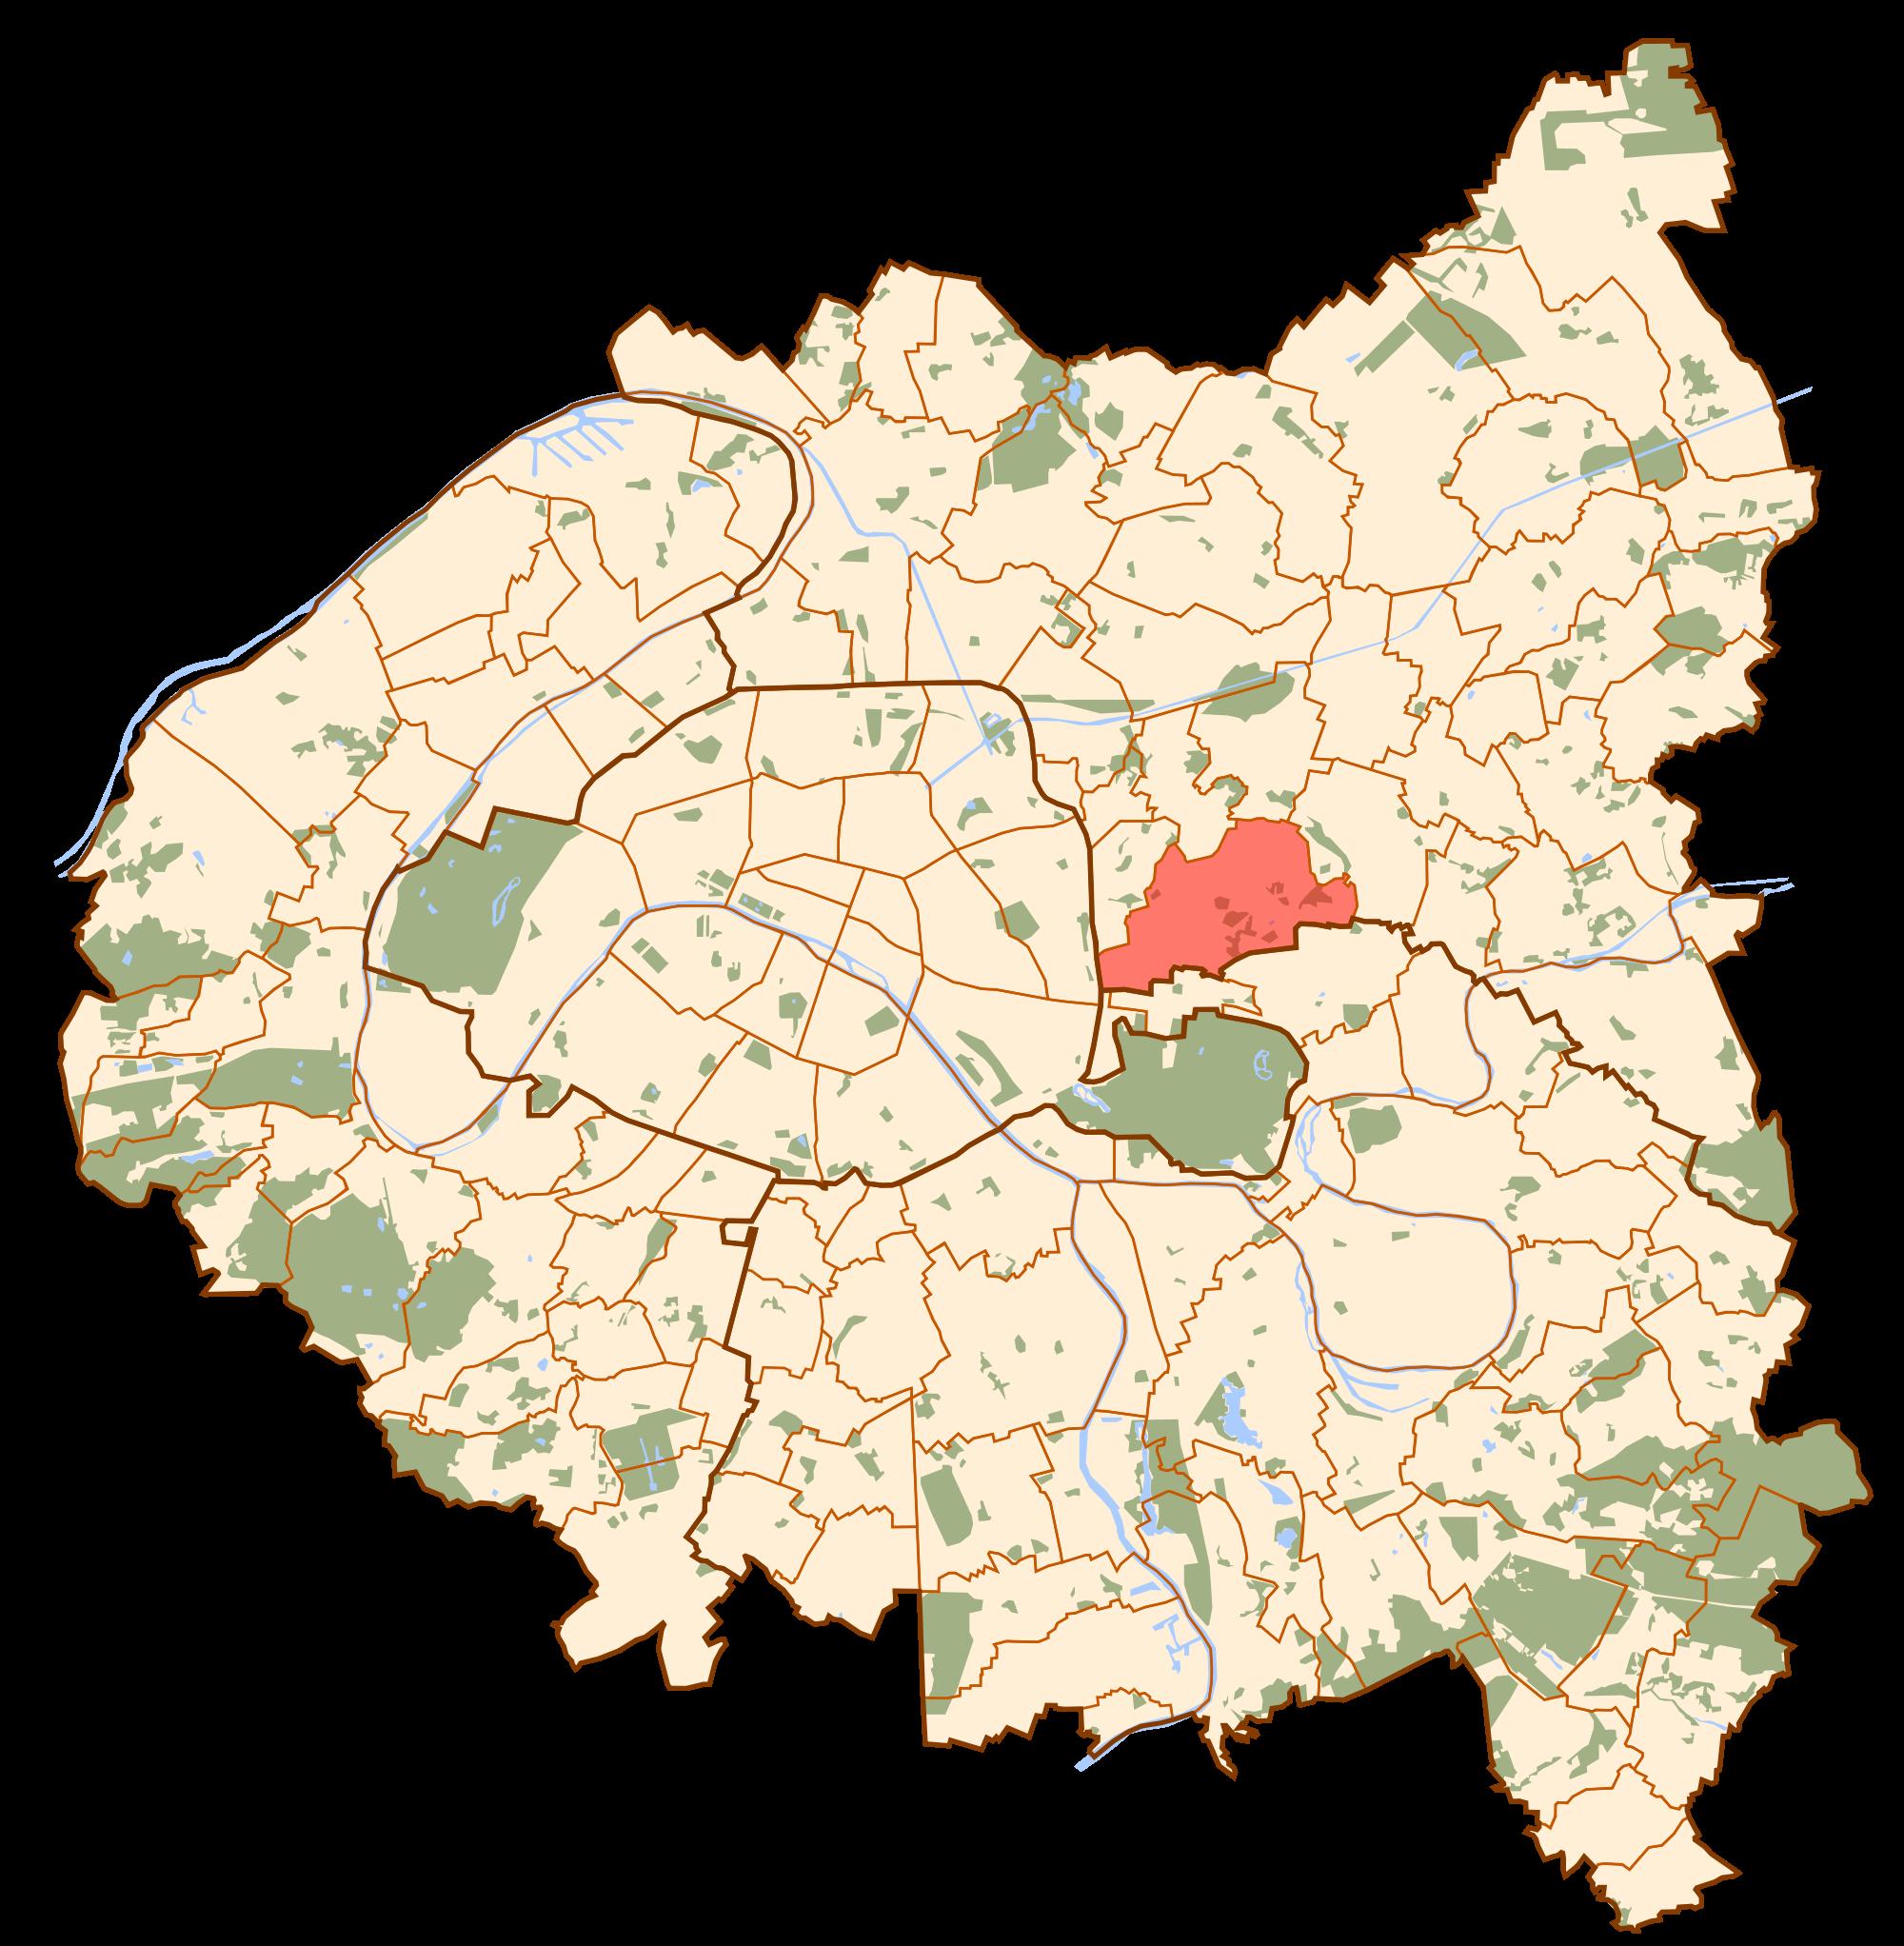 S Installer En Region Parisienne Immobilier Experts